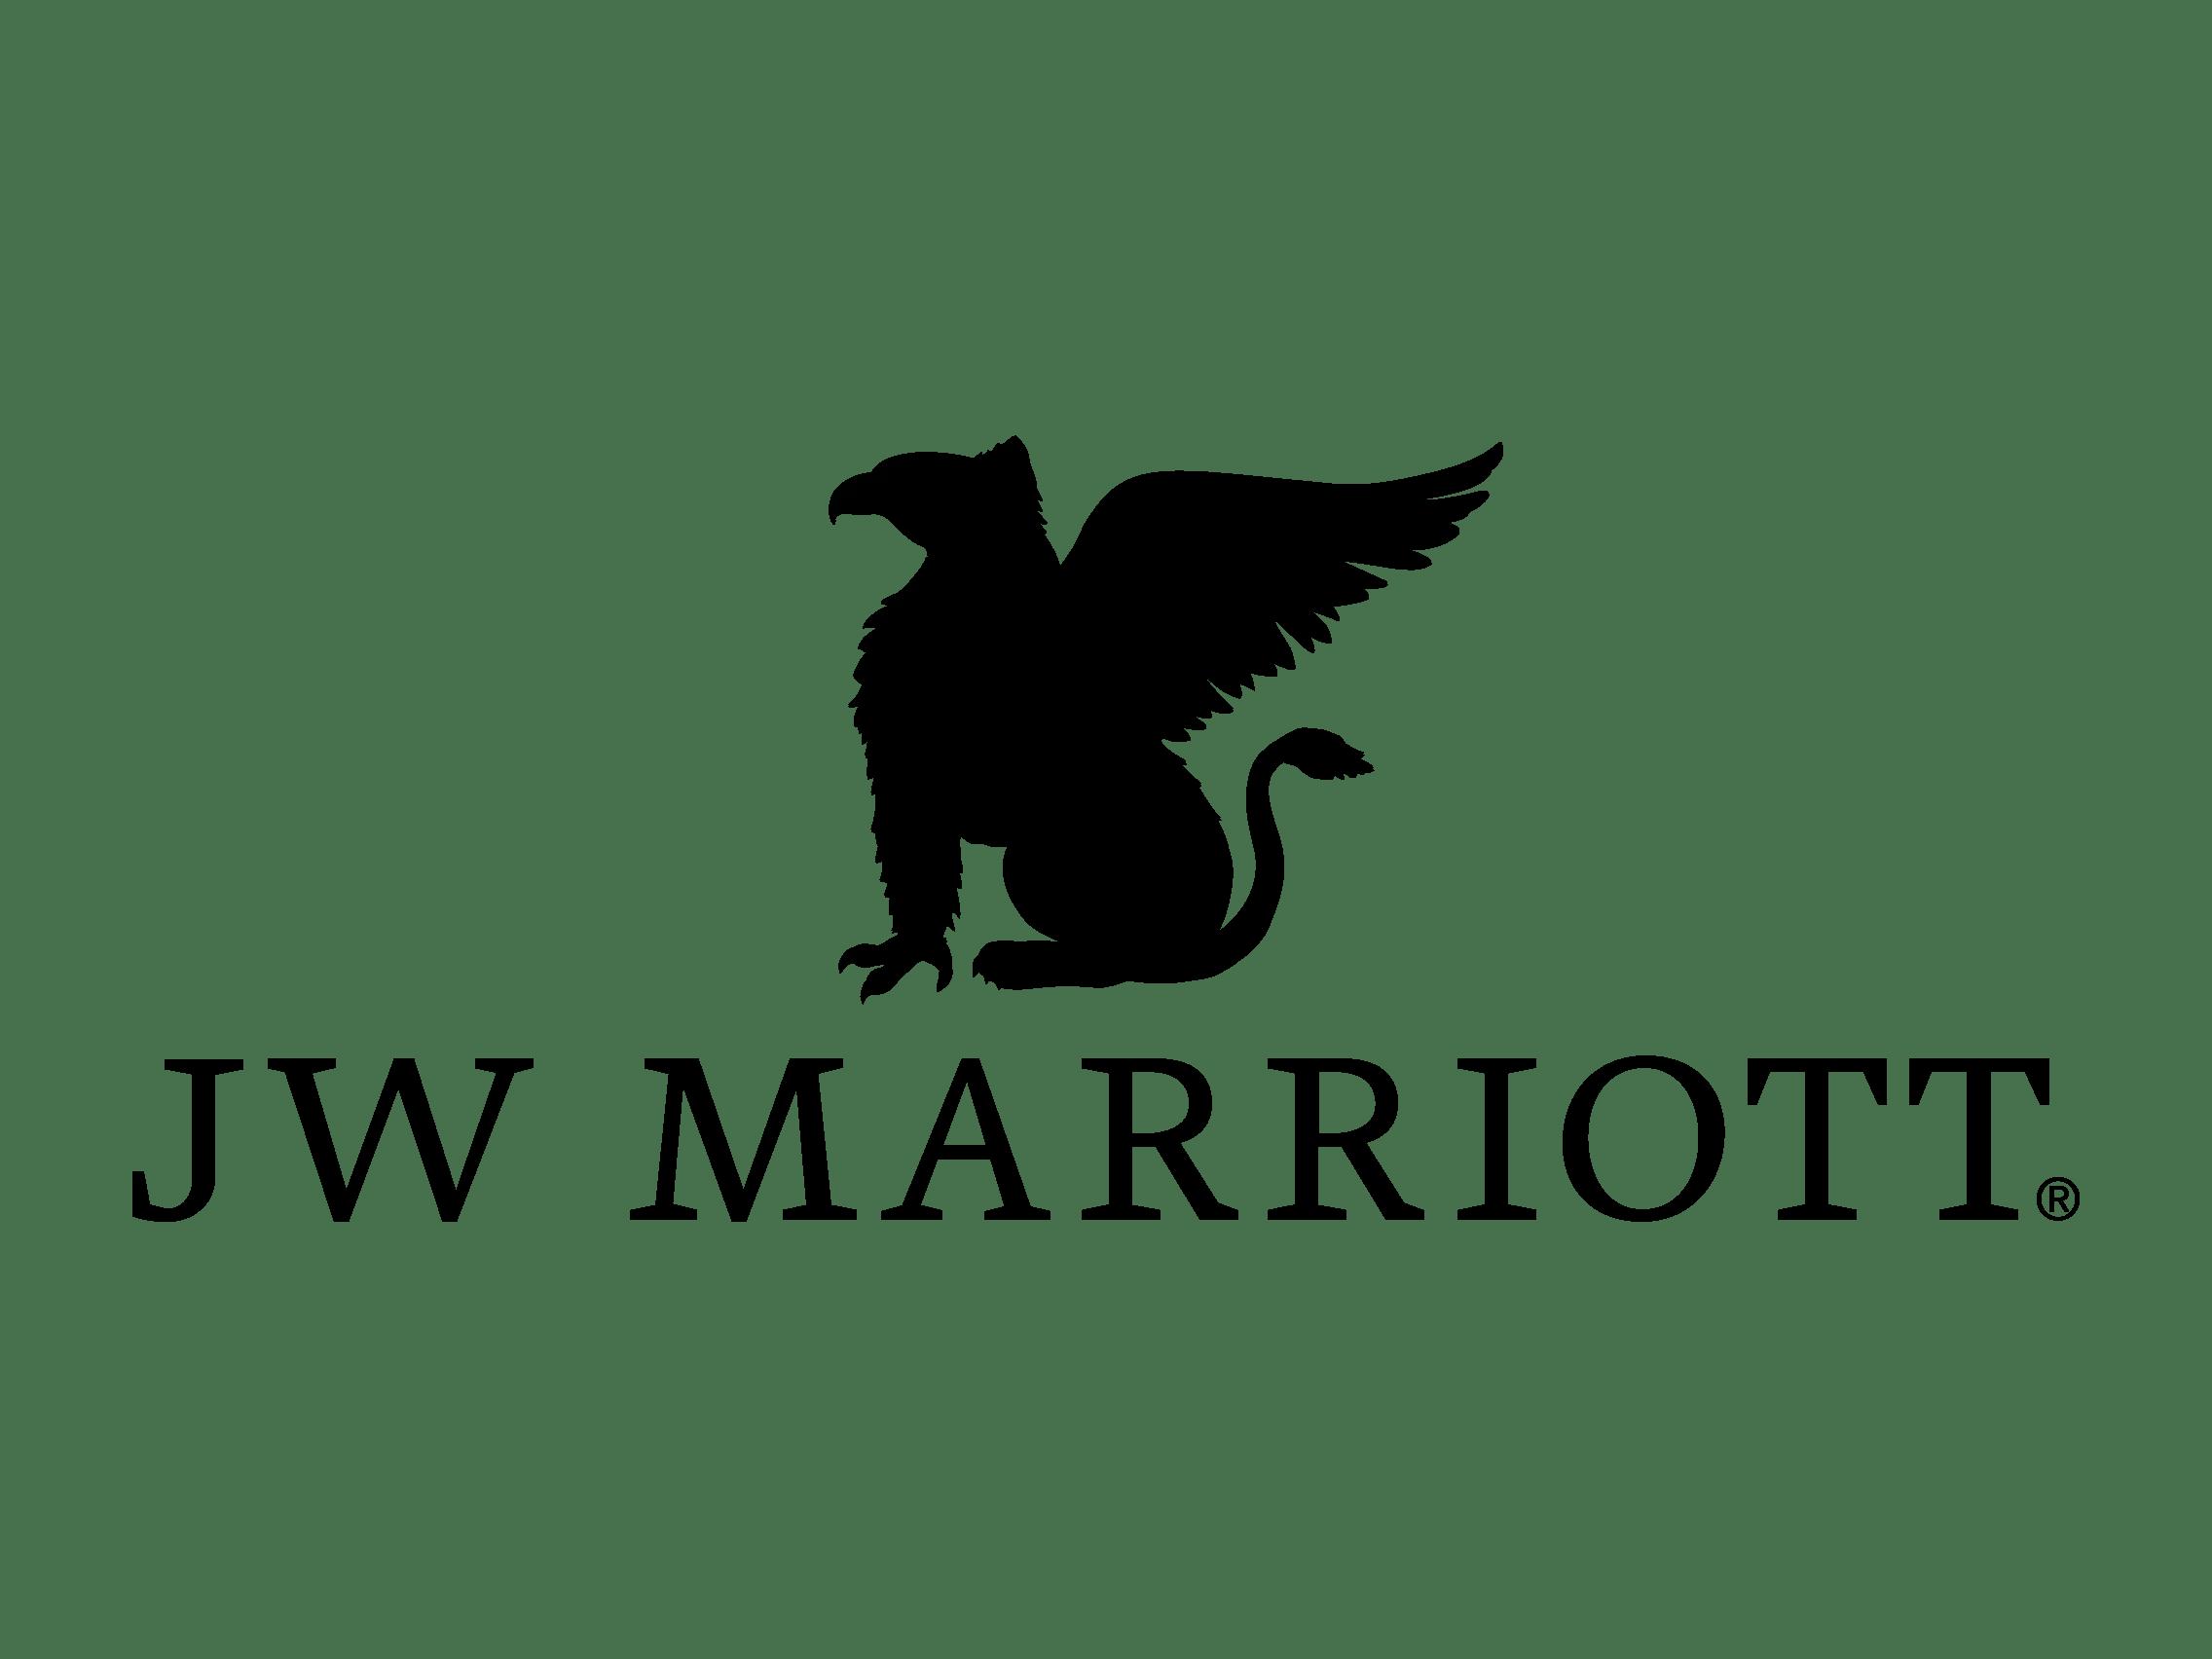 JW Marriott Provolution Team Building Client